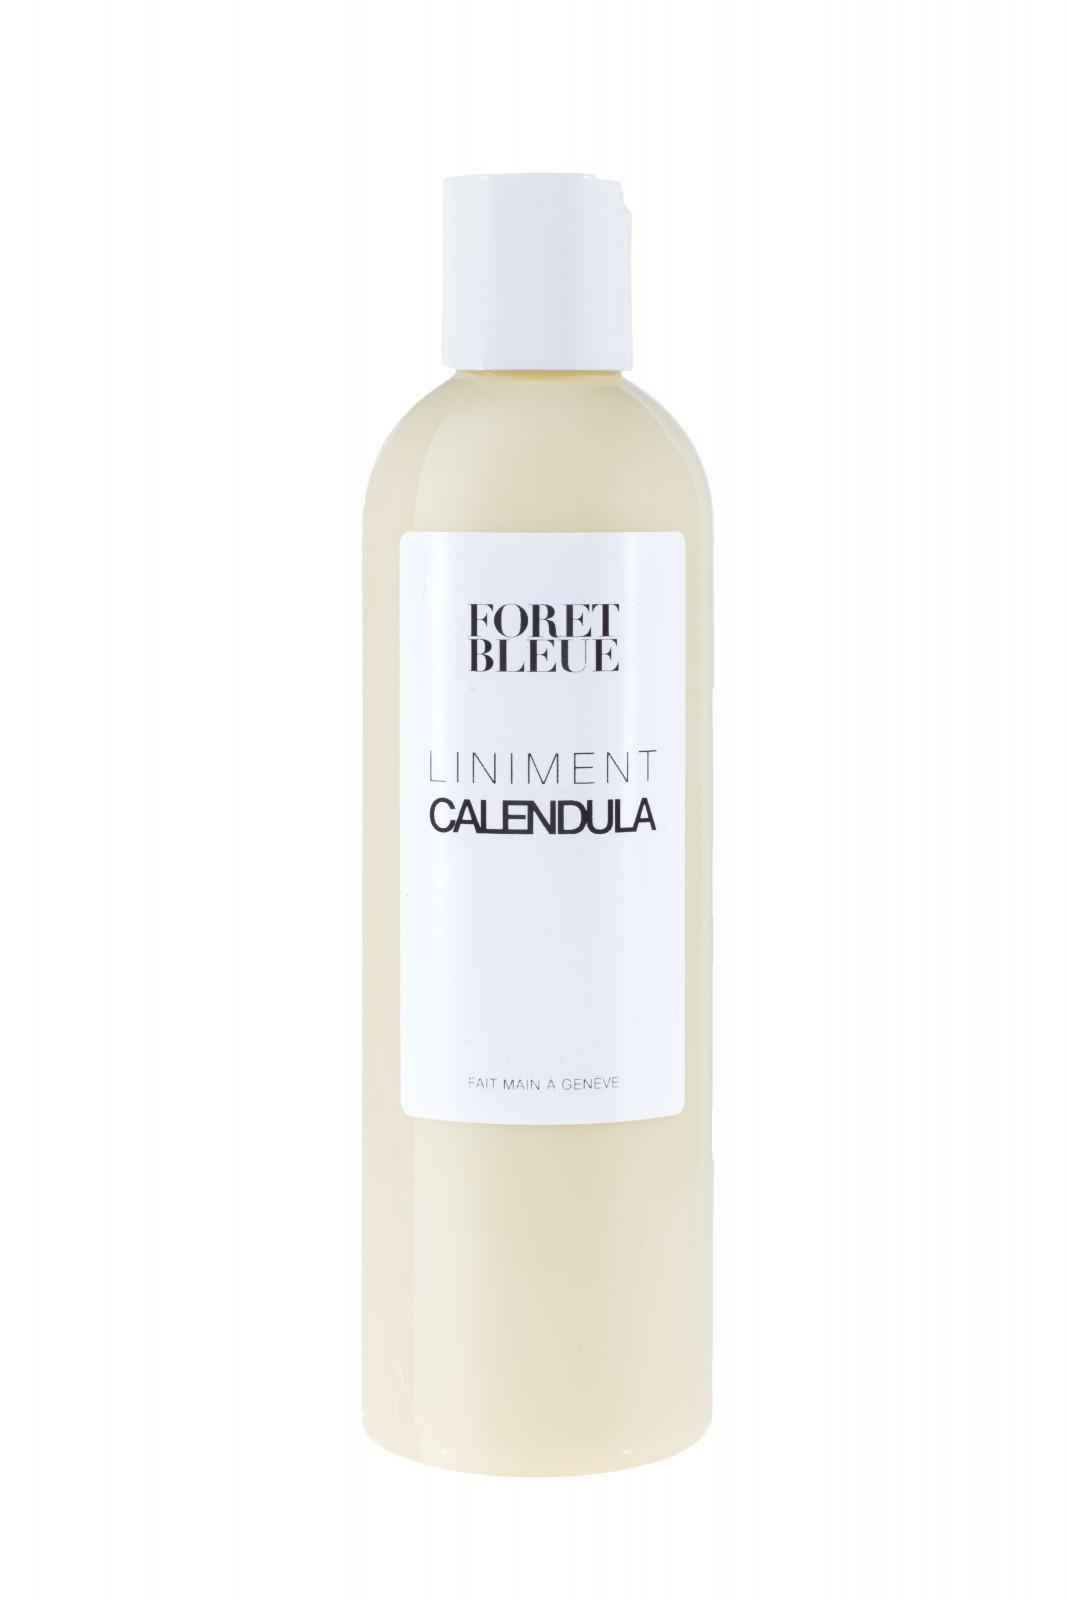 calendula liniment/foret bleue